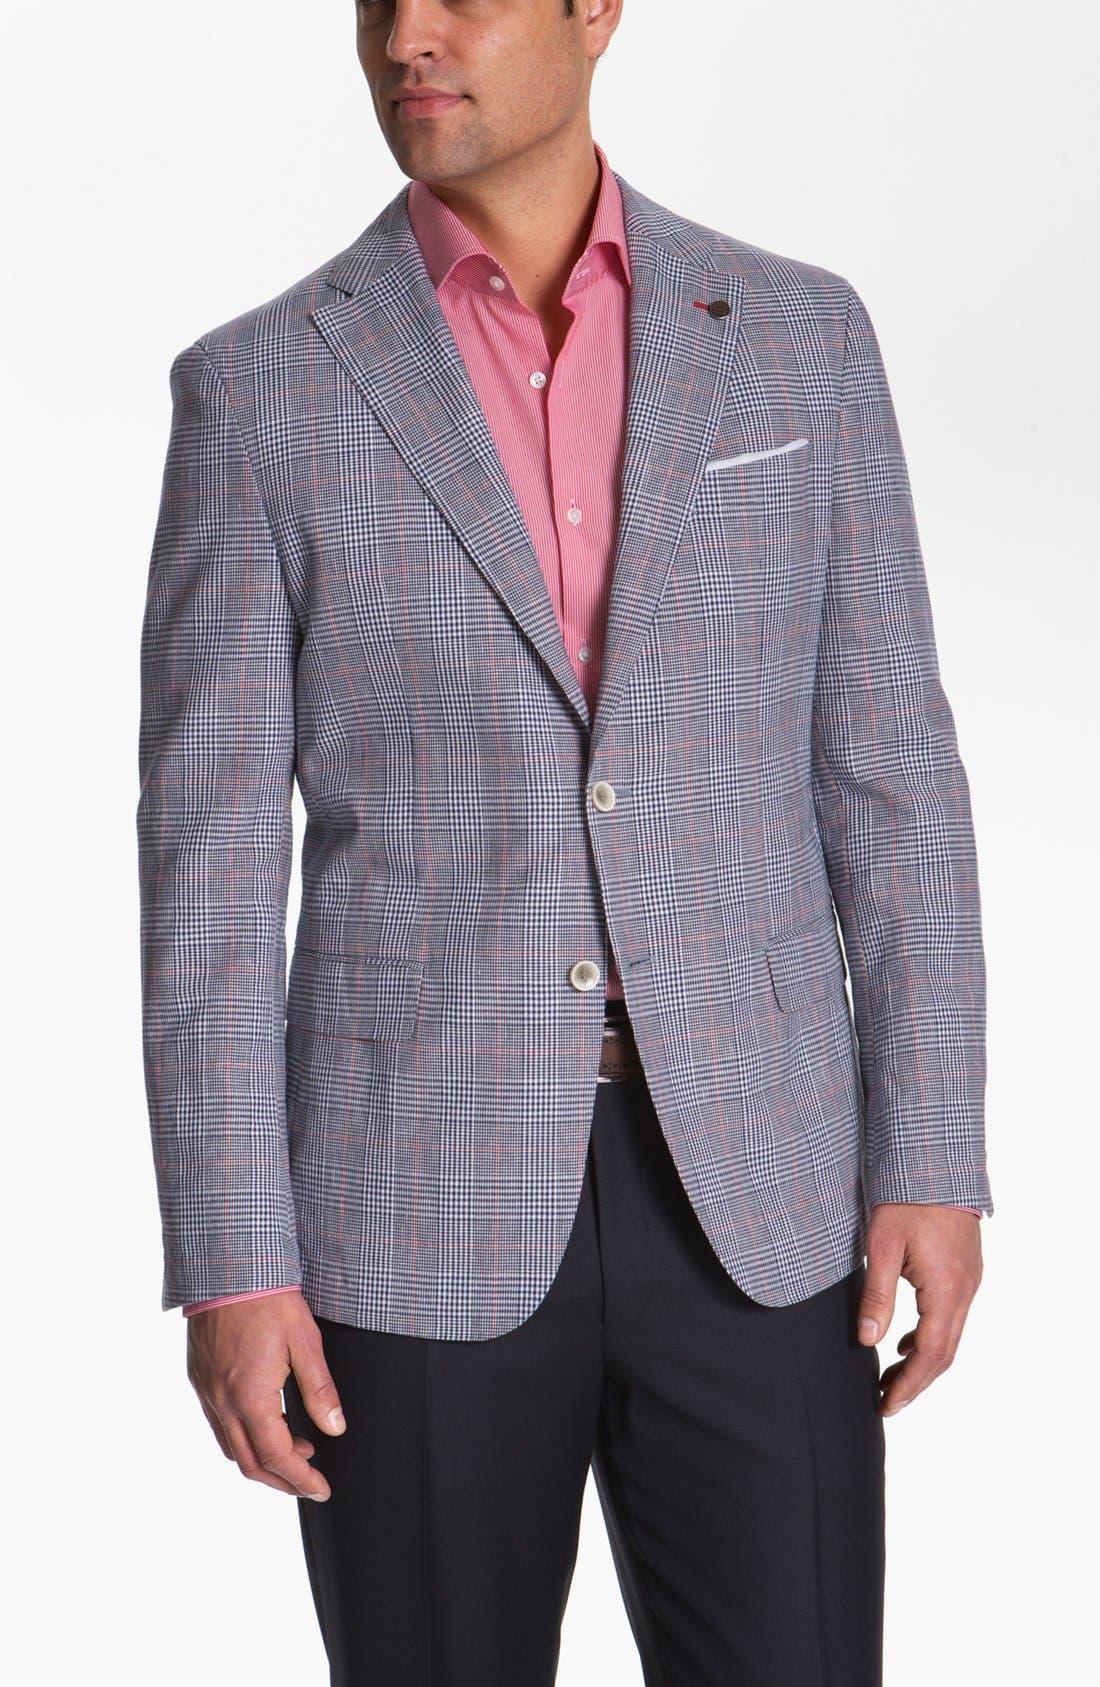 Alternate Image 1 Selected - BOSS HUGO BOSS 'Lanyon' Trim Fit Plaid Sportcoat